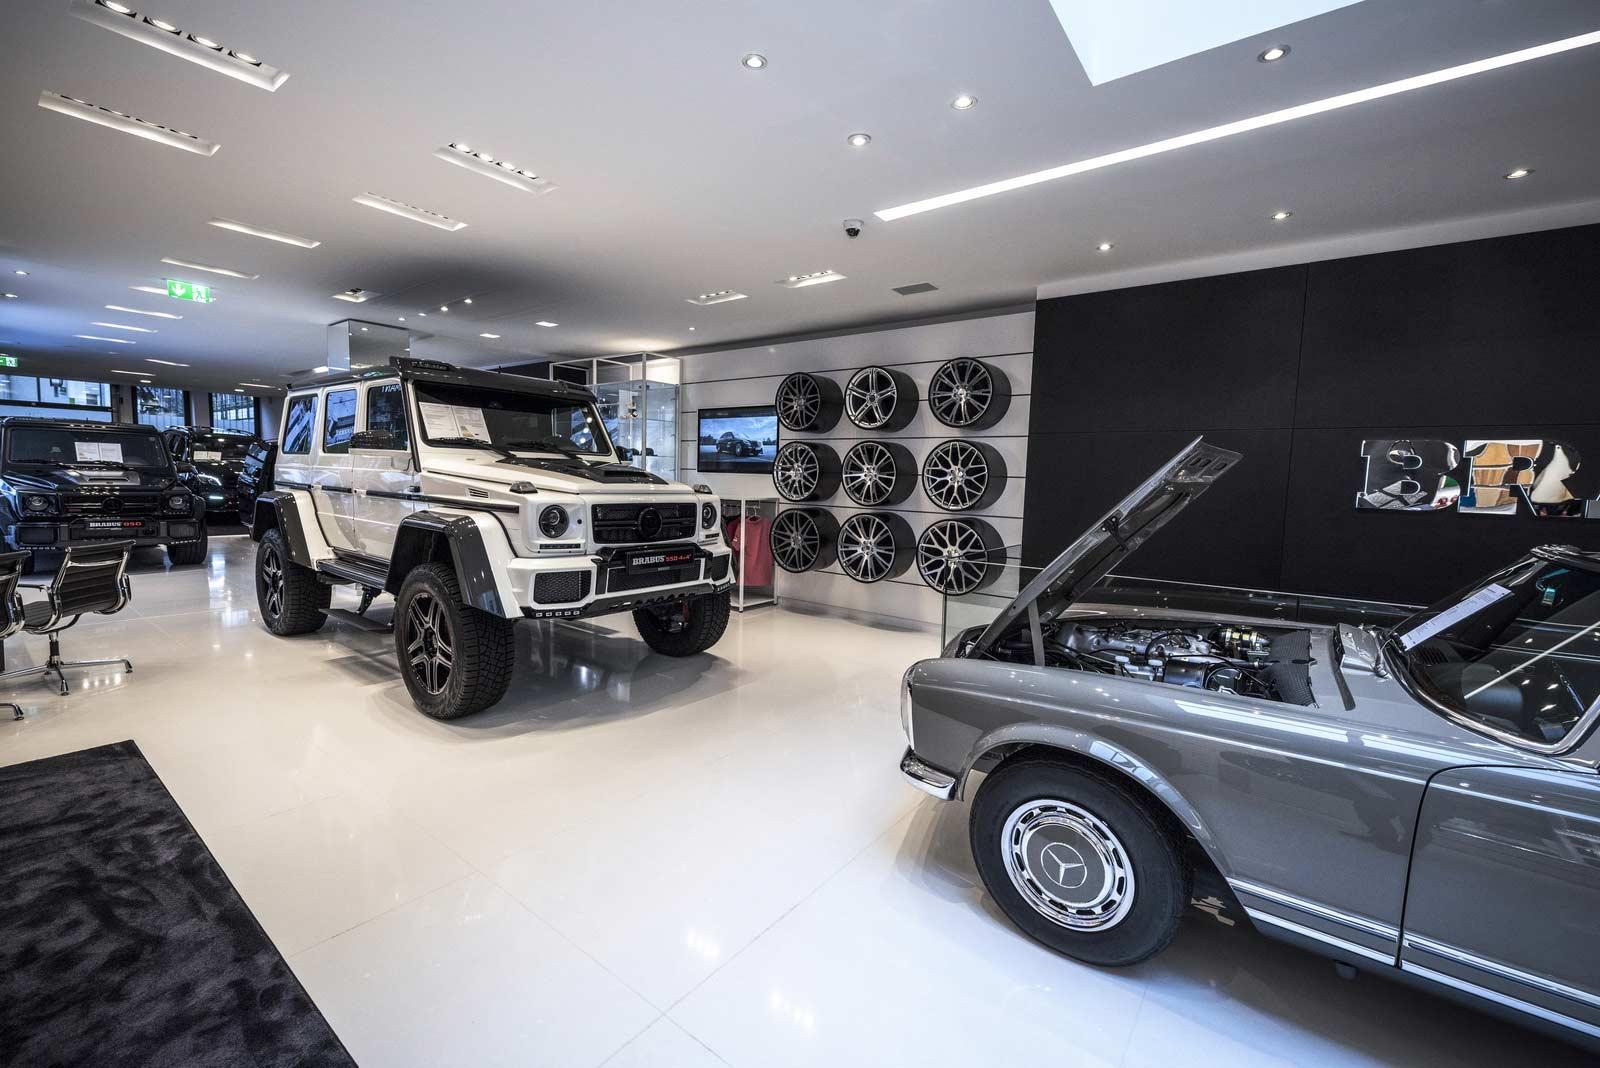 Brabus-Sunseeker-flagship-store-Dusseldorf_5